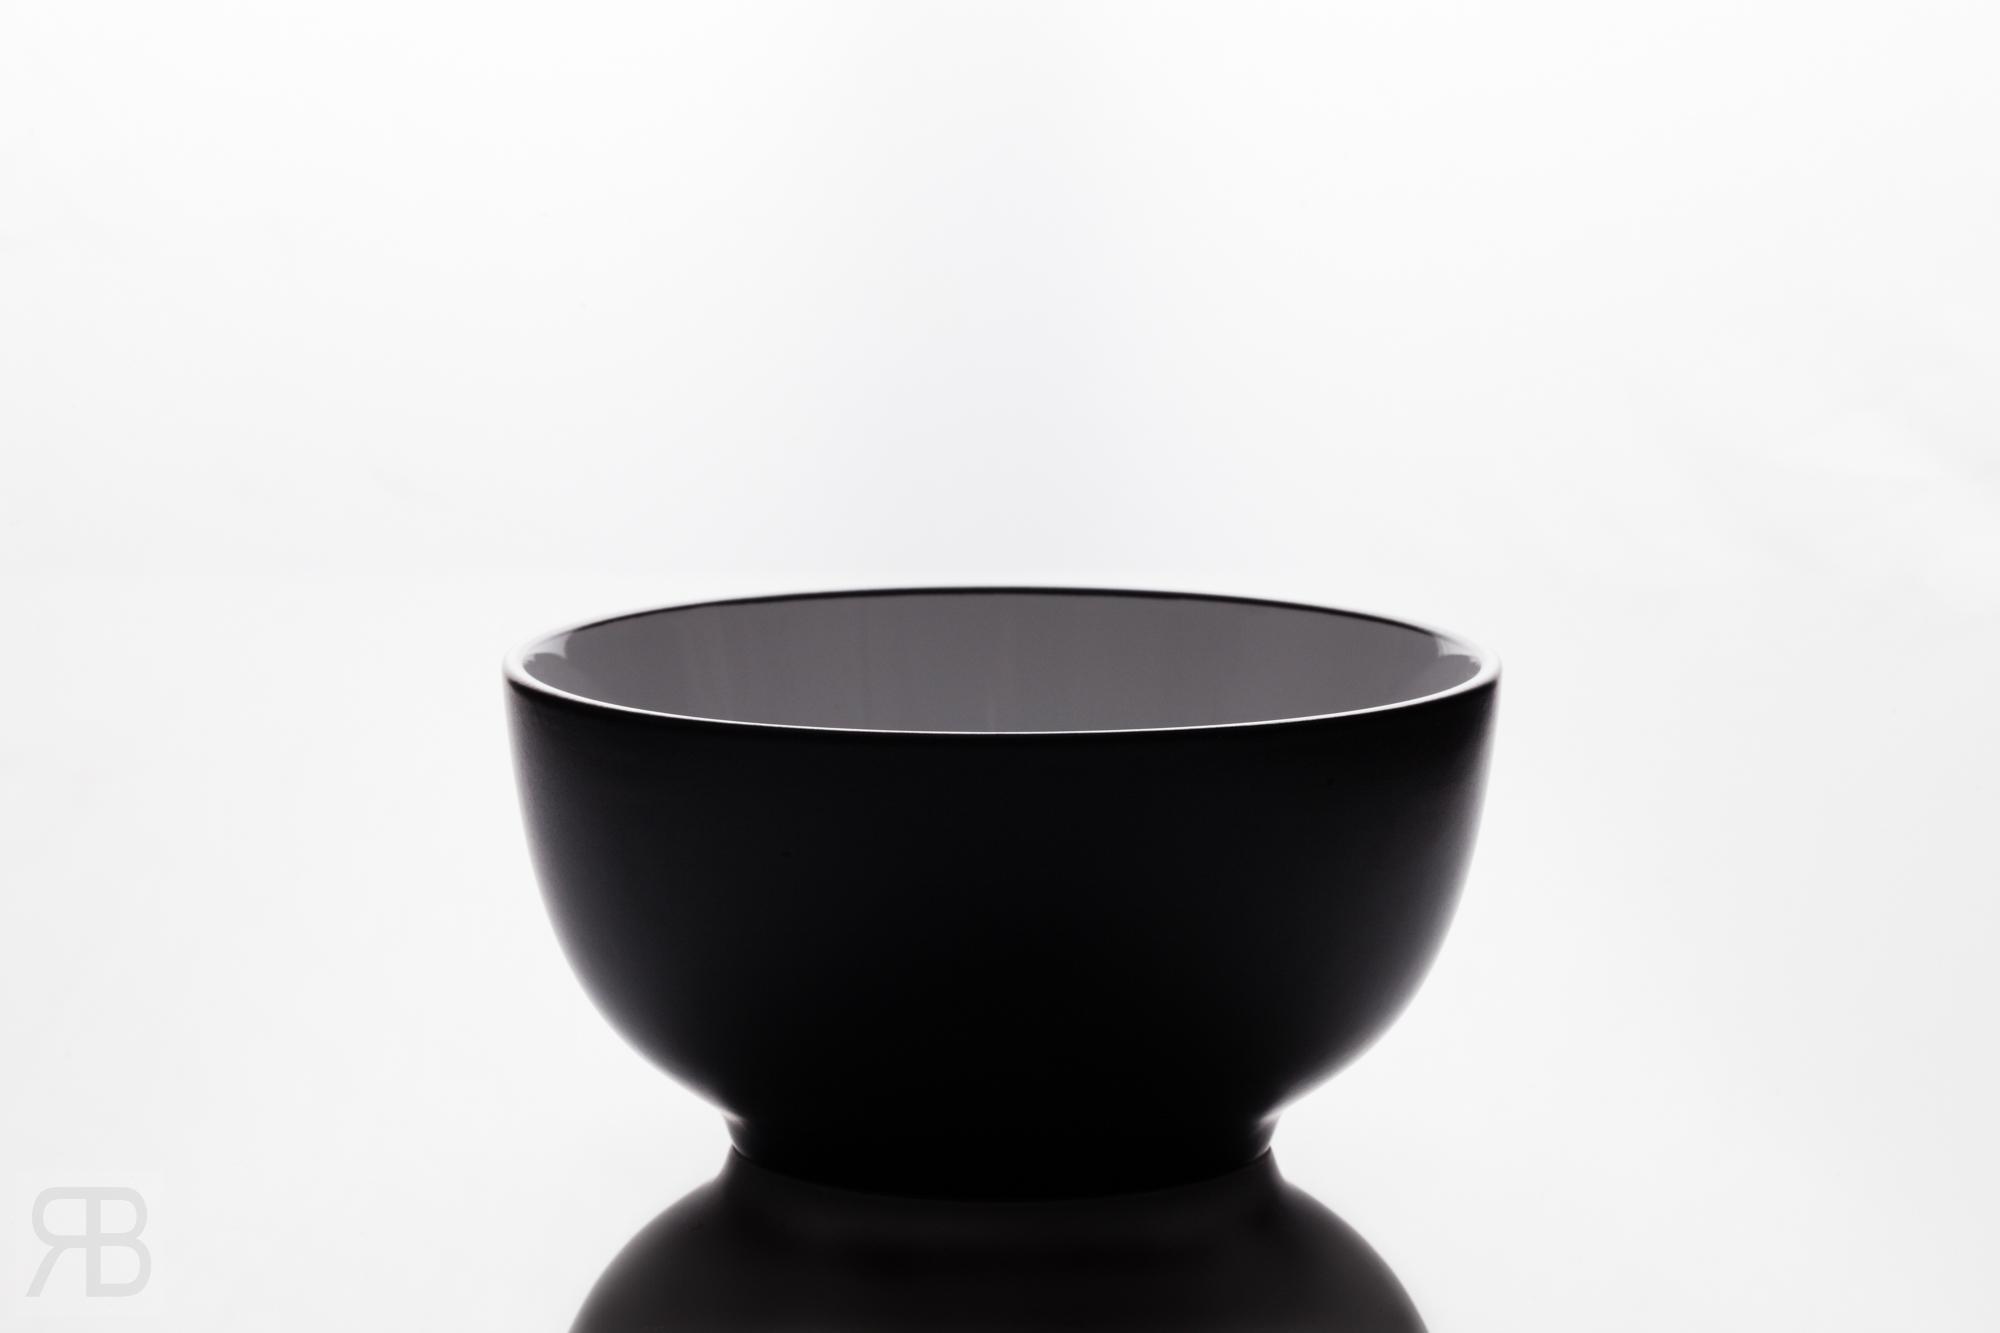 Bowl - Tesco Range